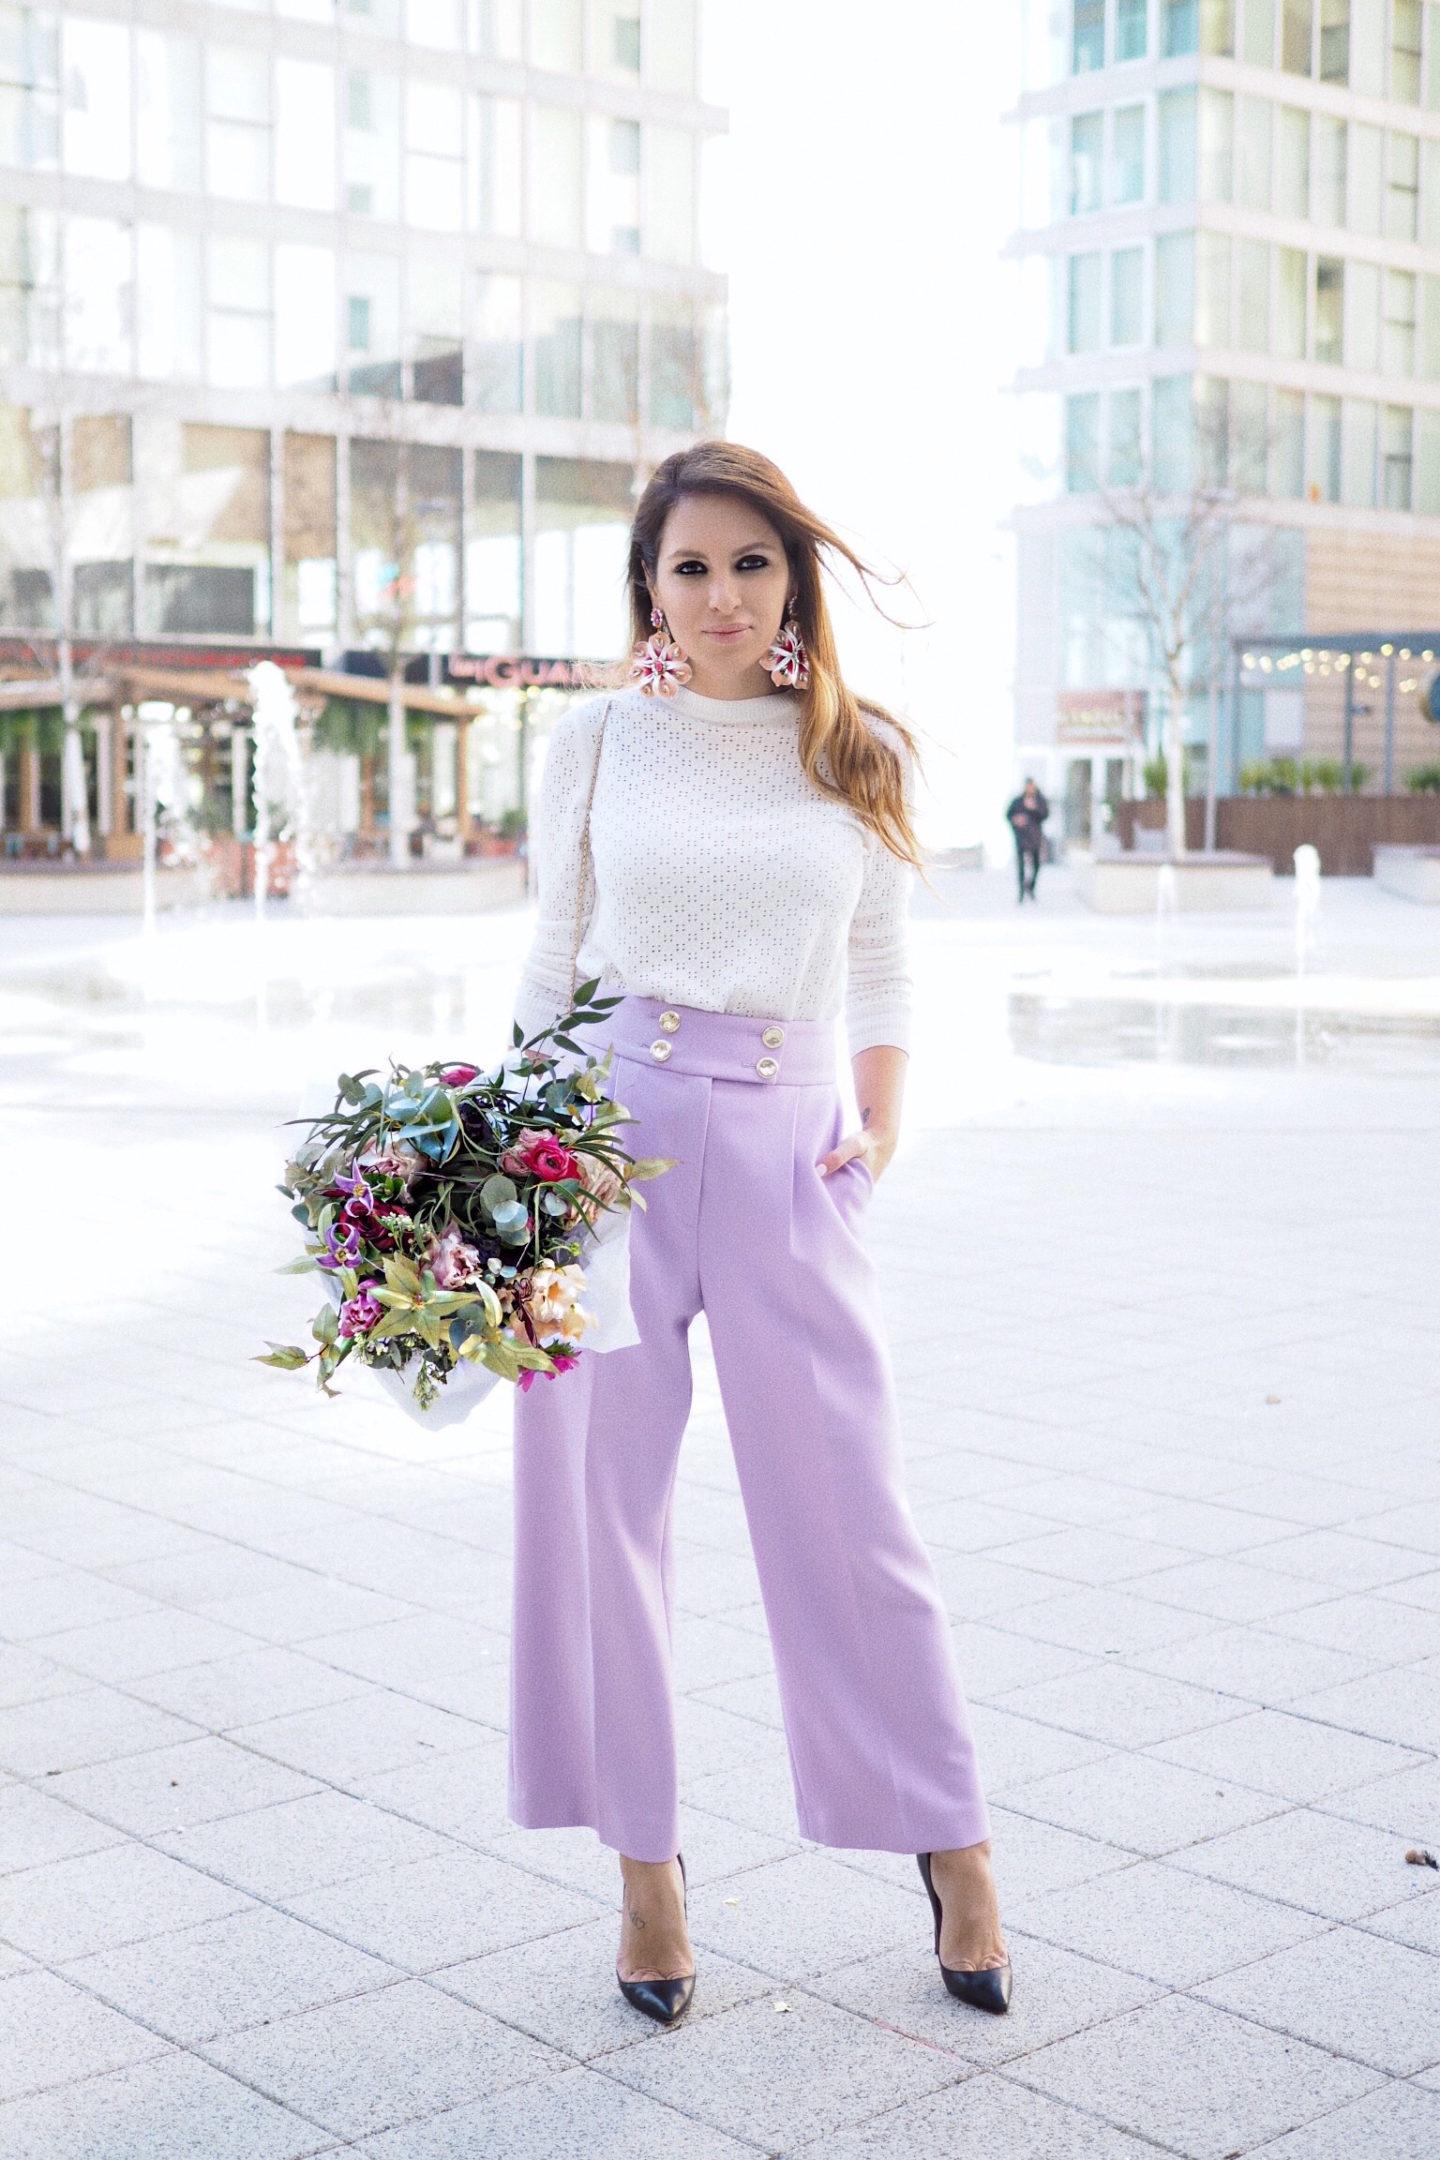 uterque street style fashion bloggers